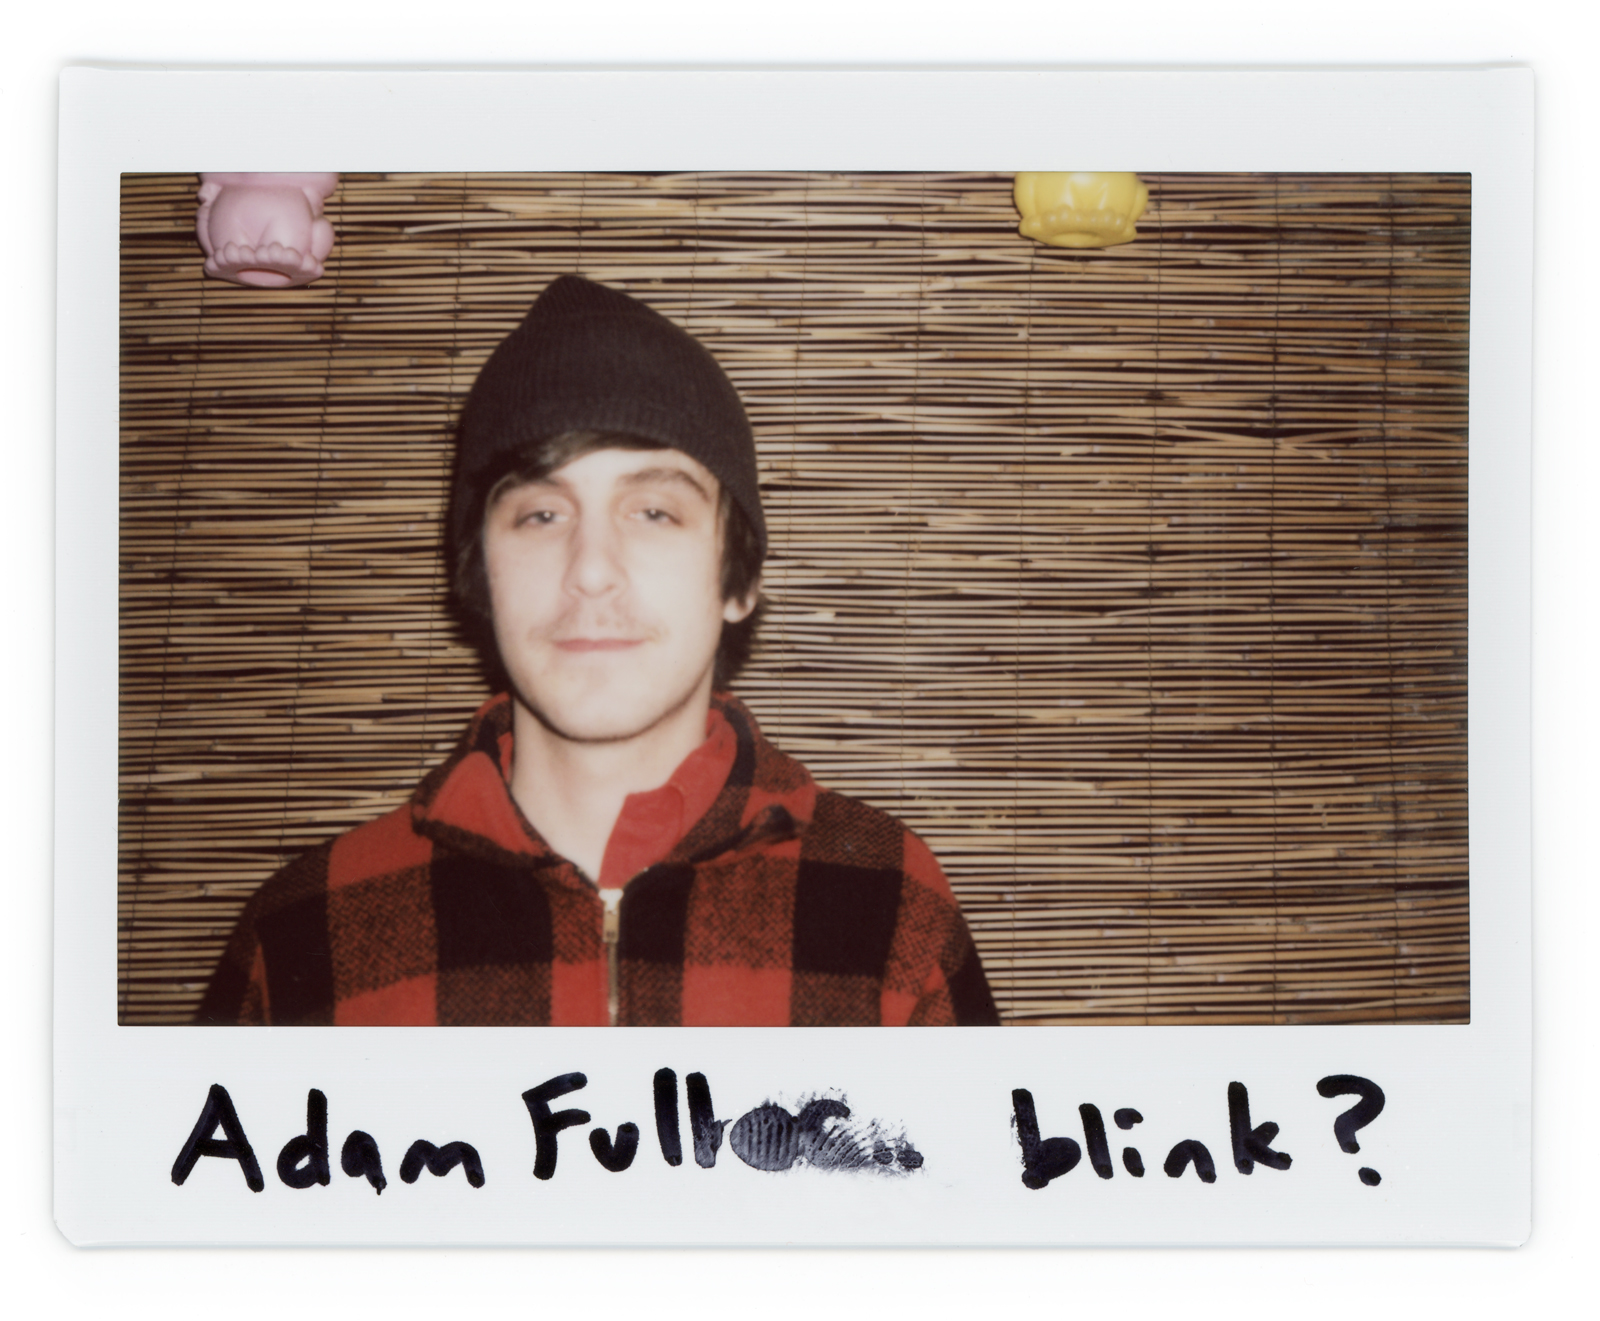 Adam_F.jpg